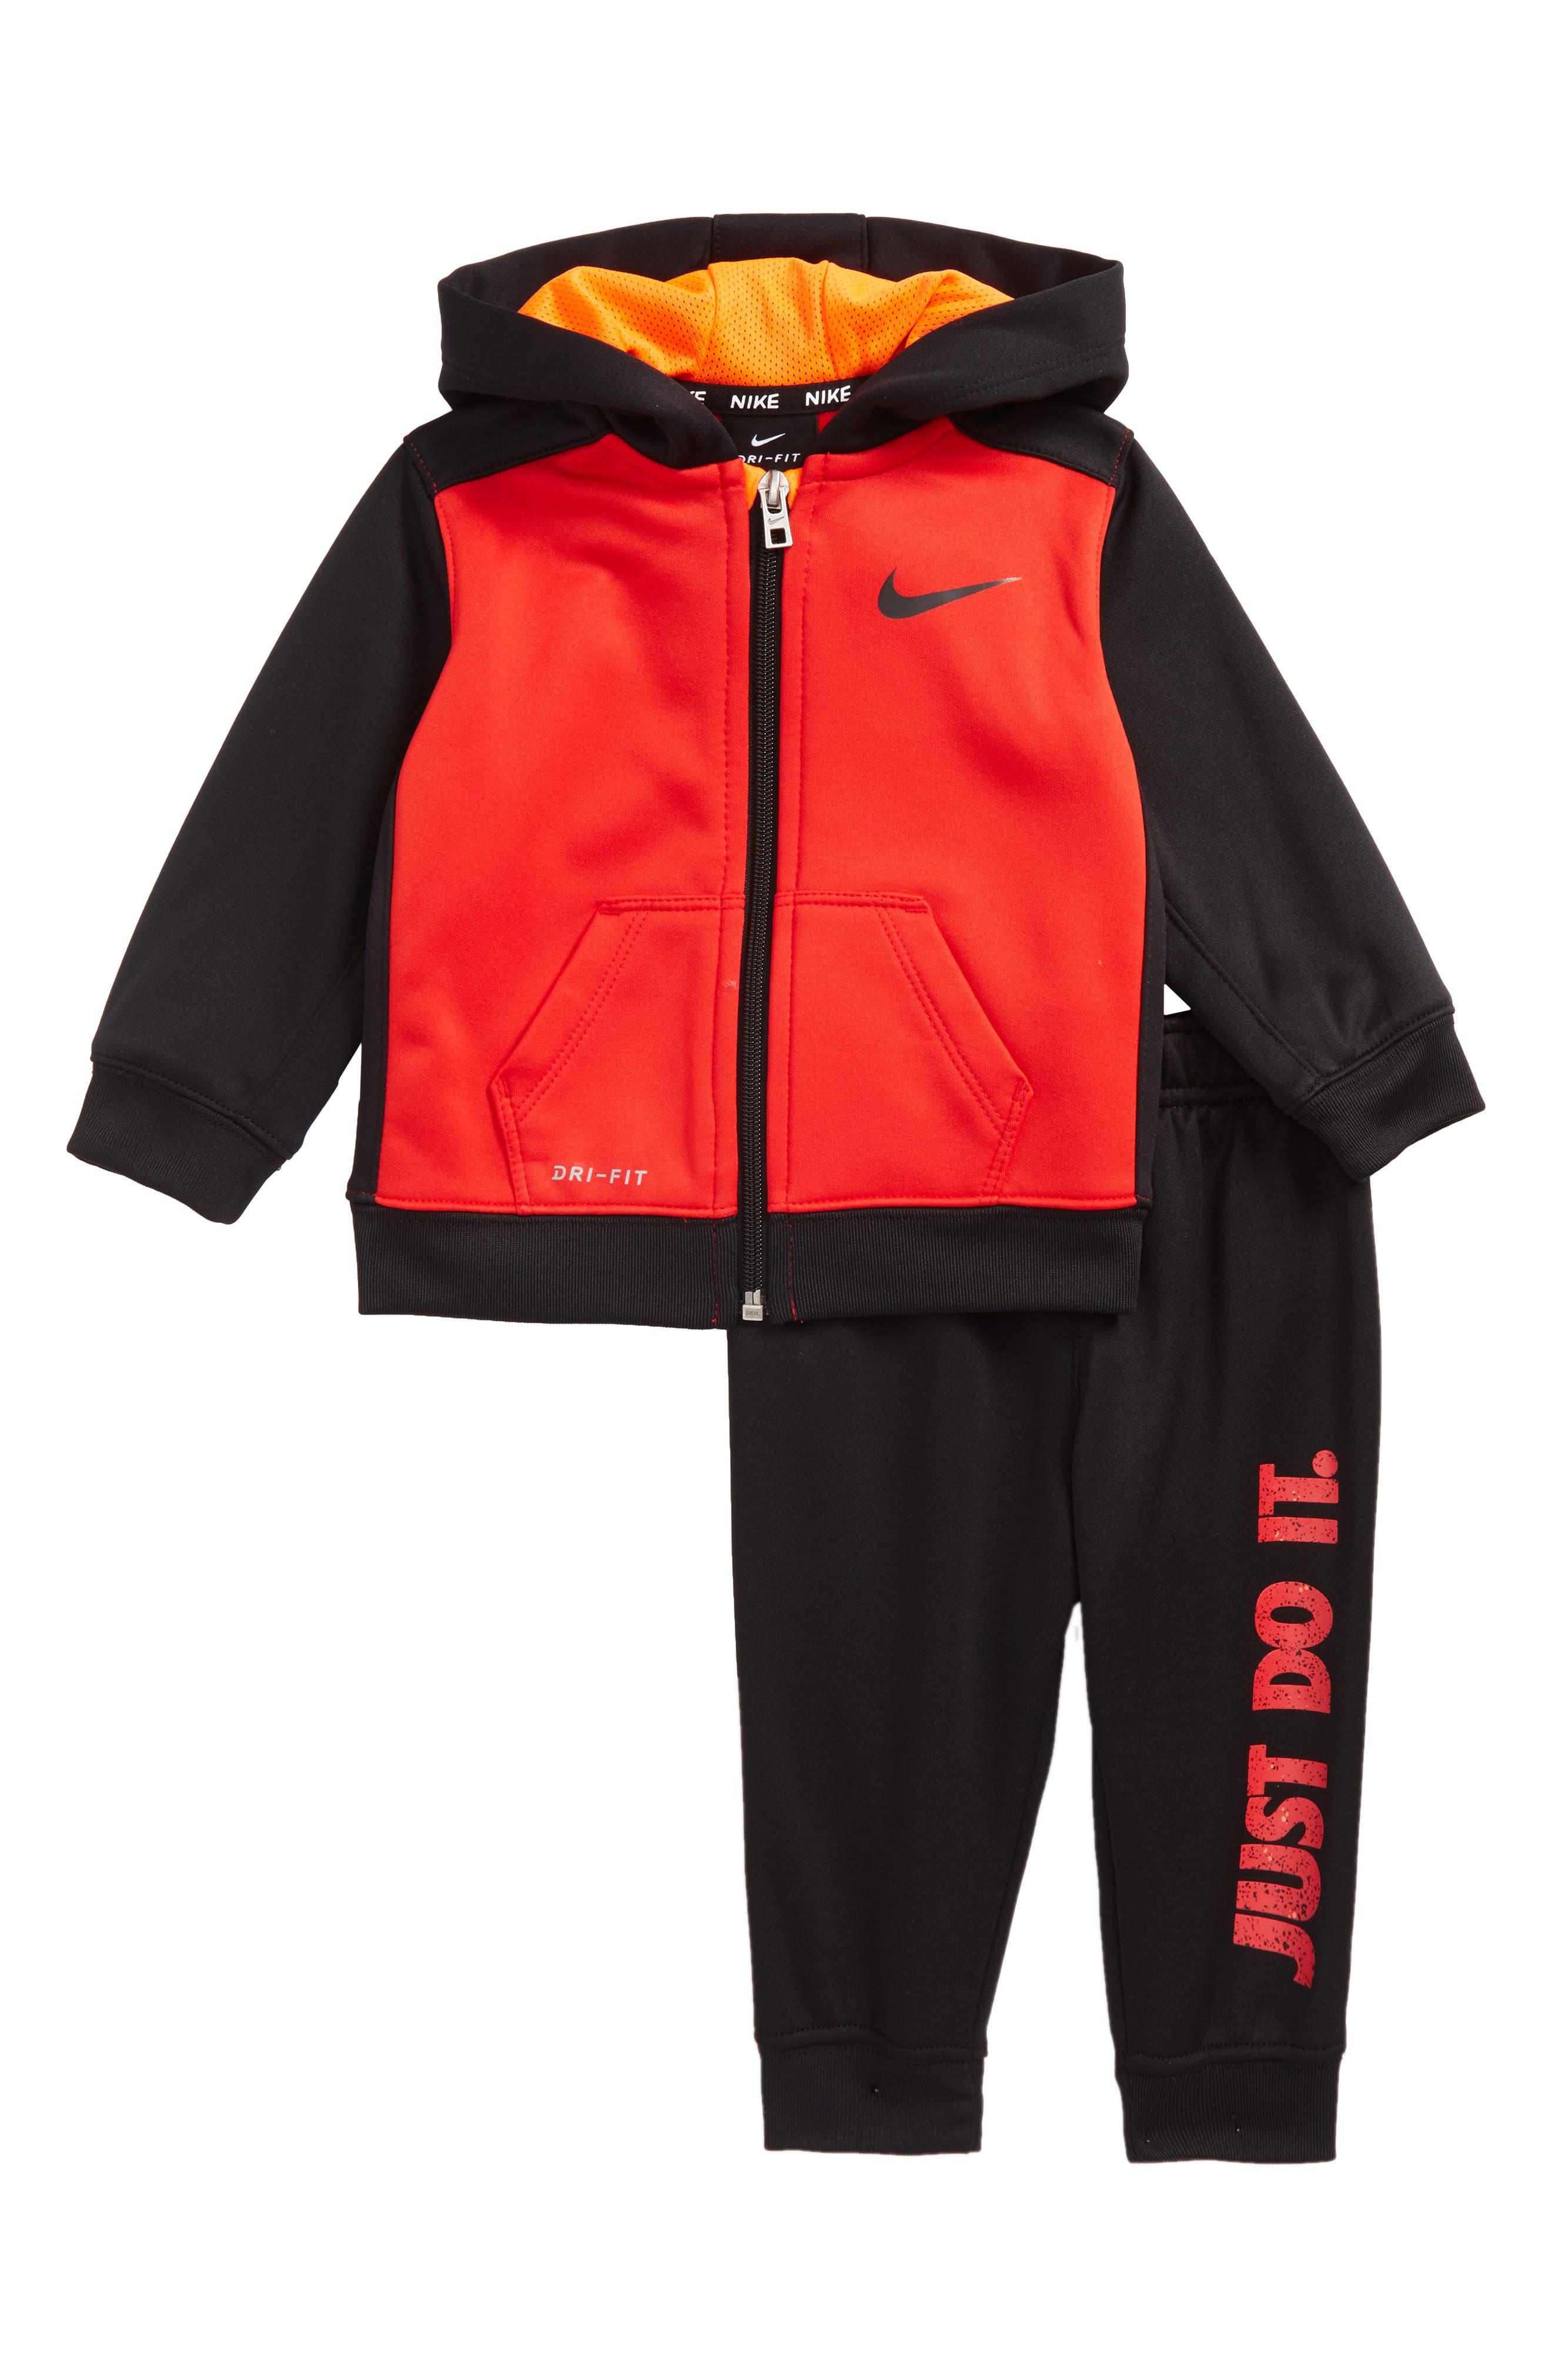 Therma-FIT Hoodie & Pants Set,                         Main,                         color, Black/ University Red